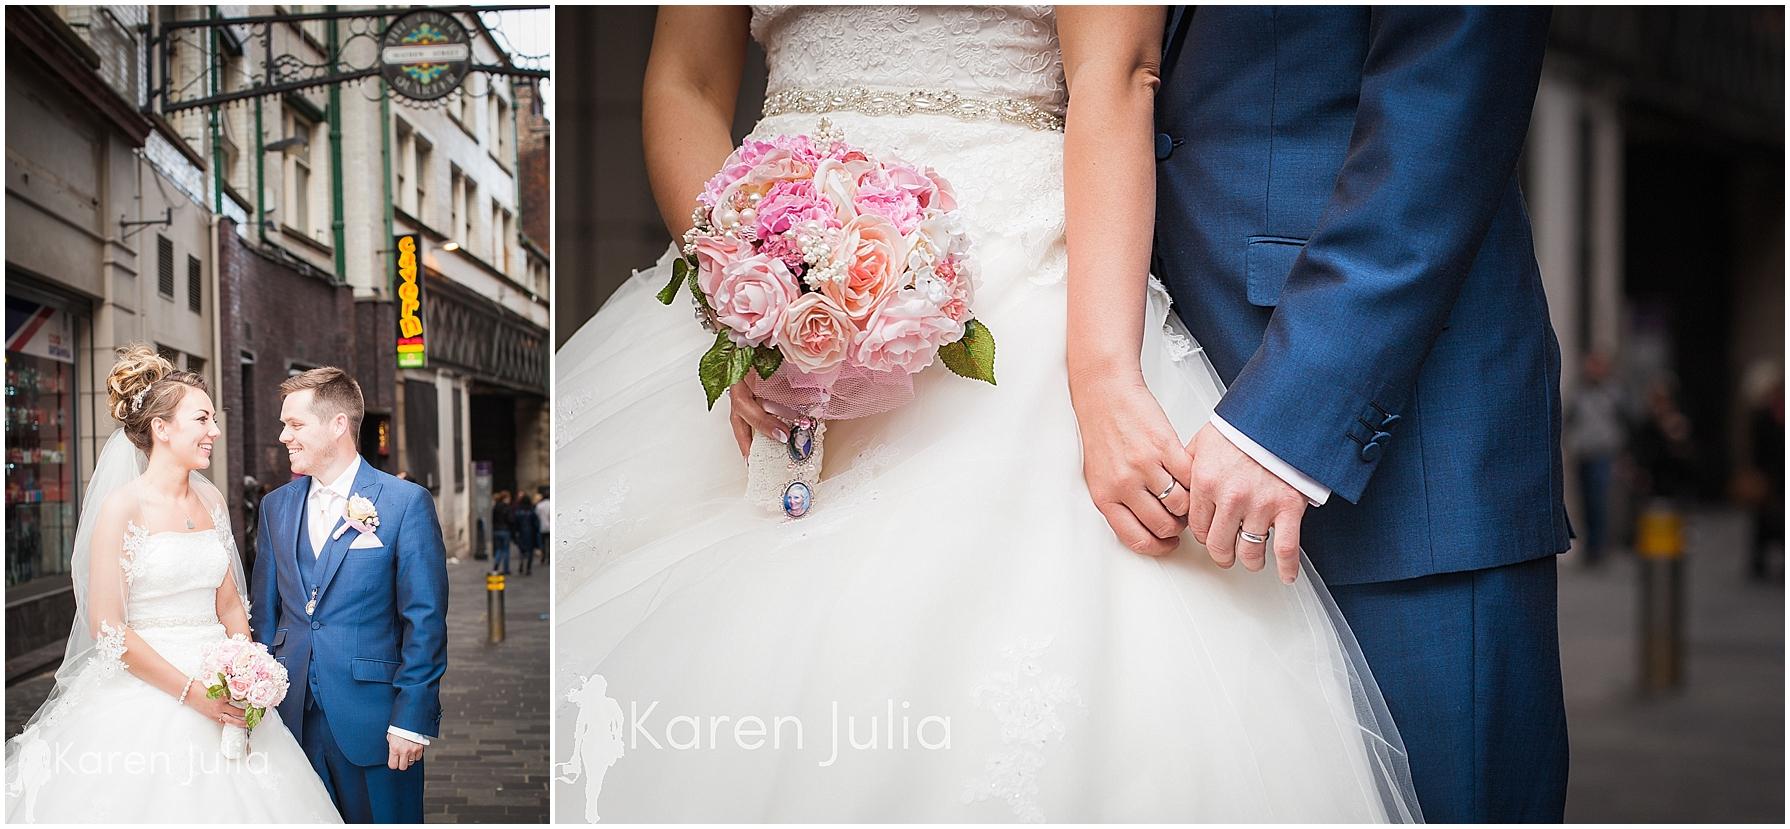 Matthew Street wedding portraits